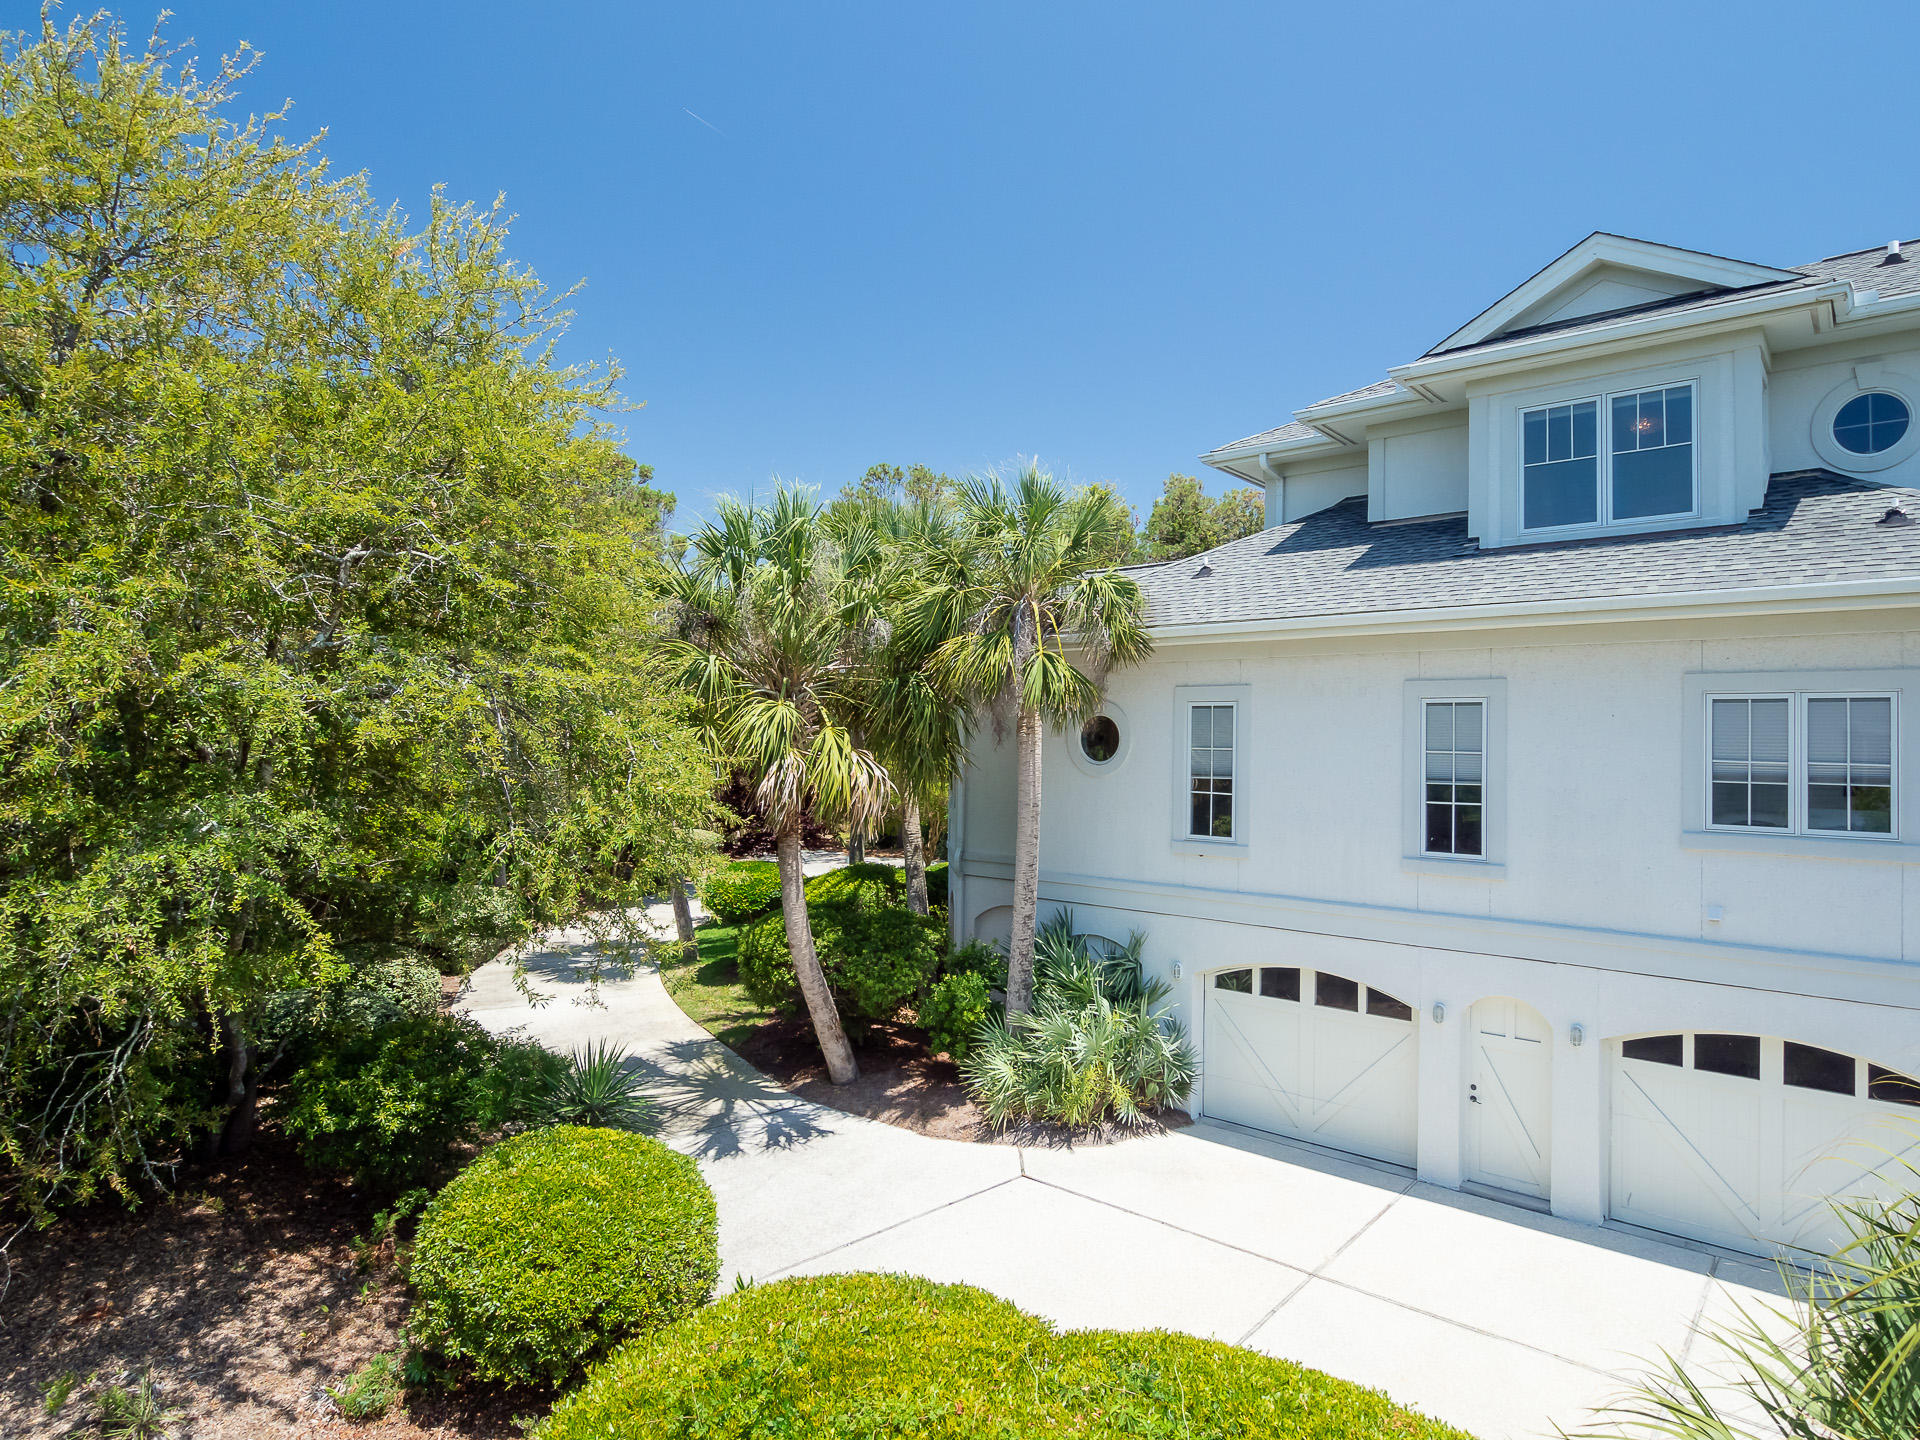 Seabrook Island Homes For Sale - 2216 Rolling Dune, Seabrook Island, SC - 1